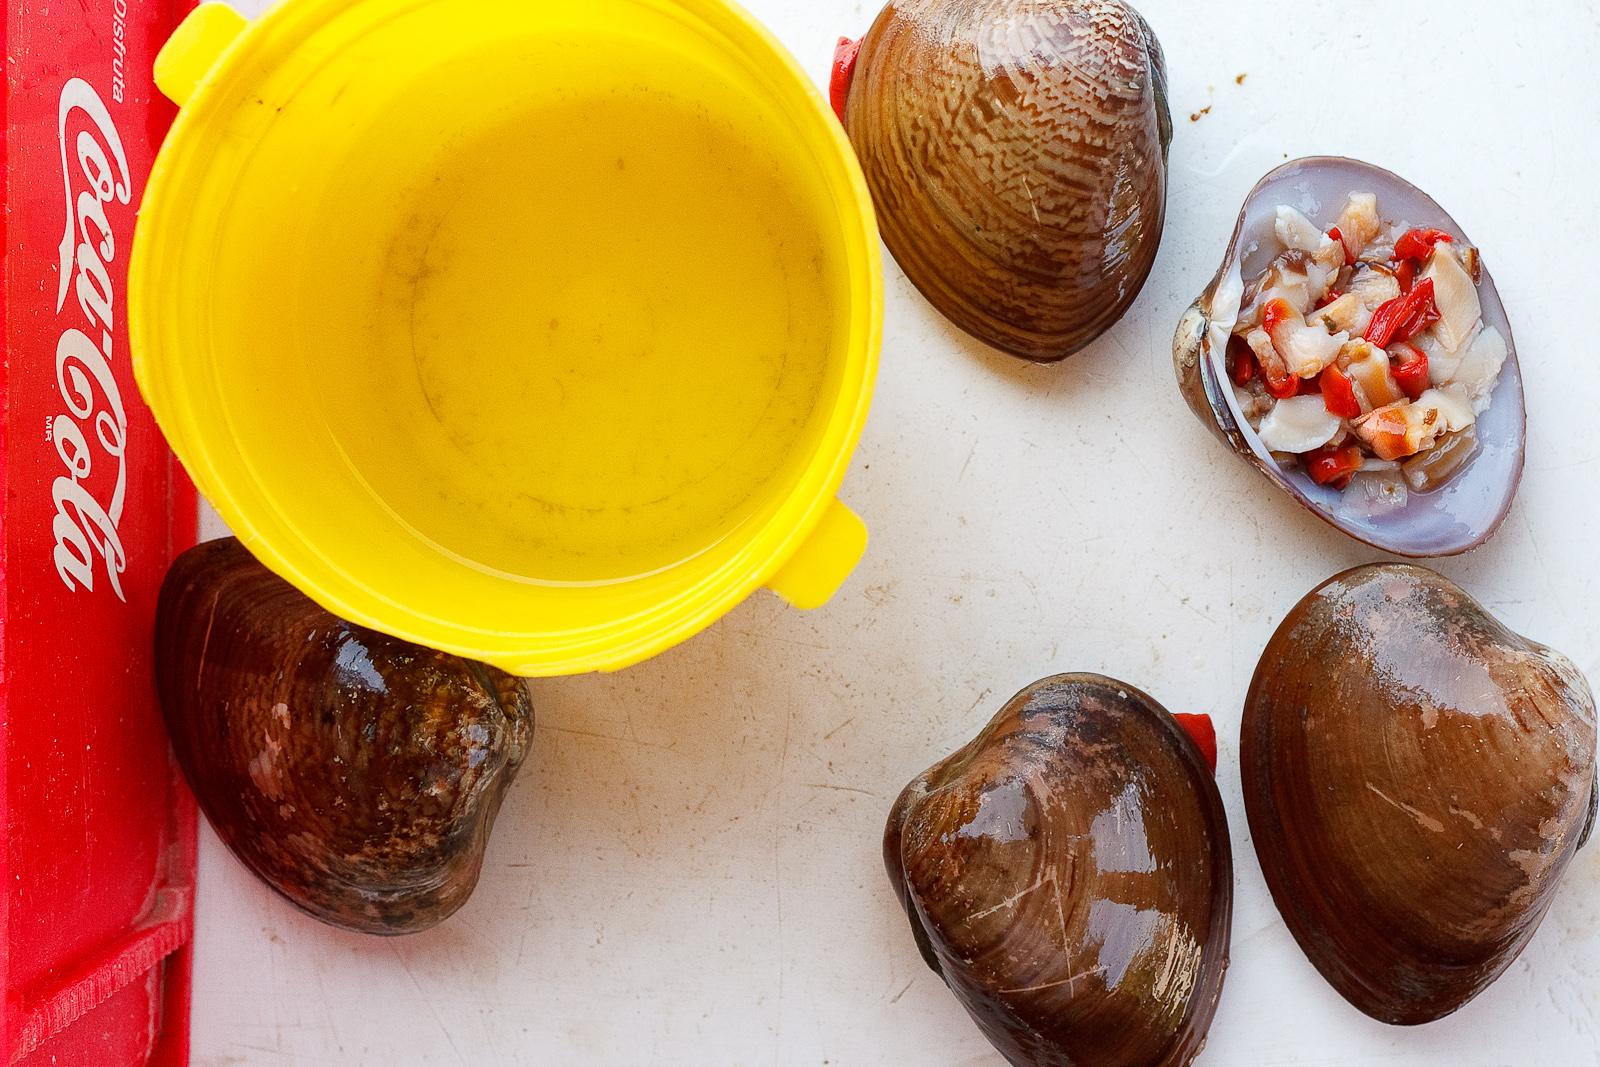 Almejas chocolatas (chocolate clams)